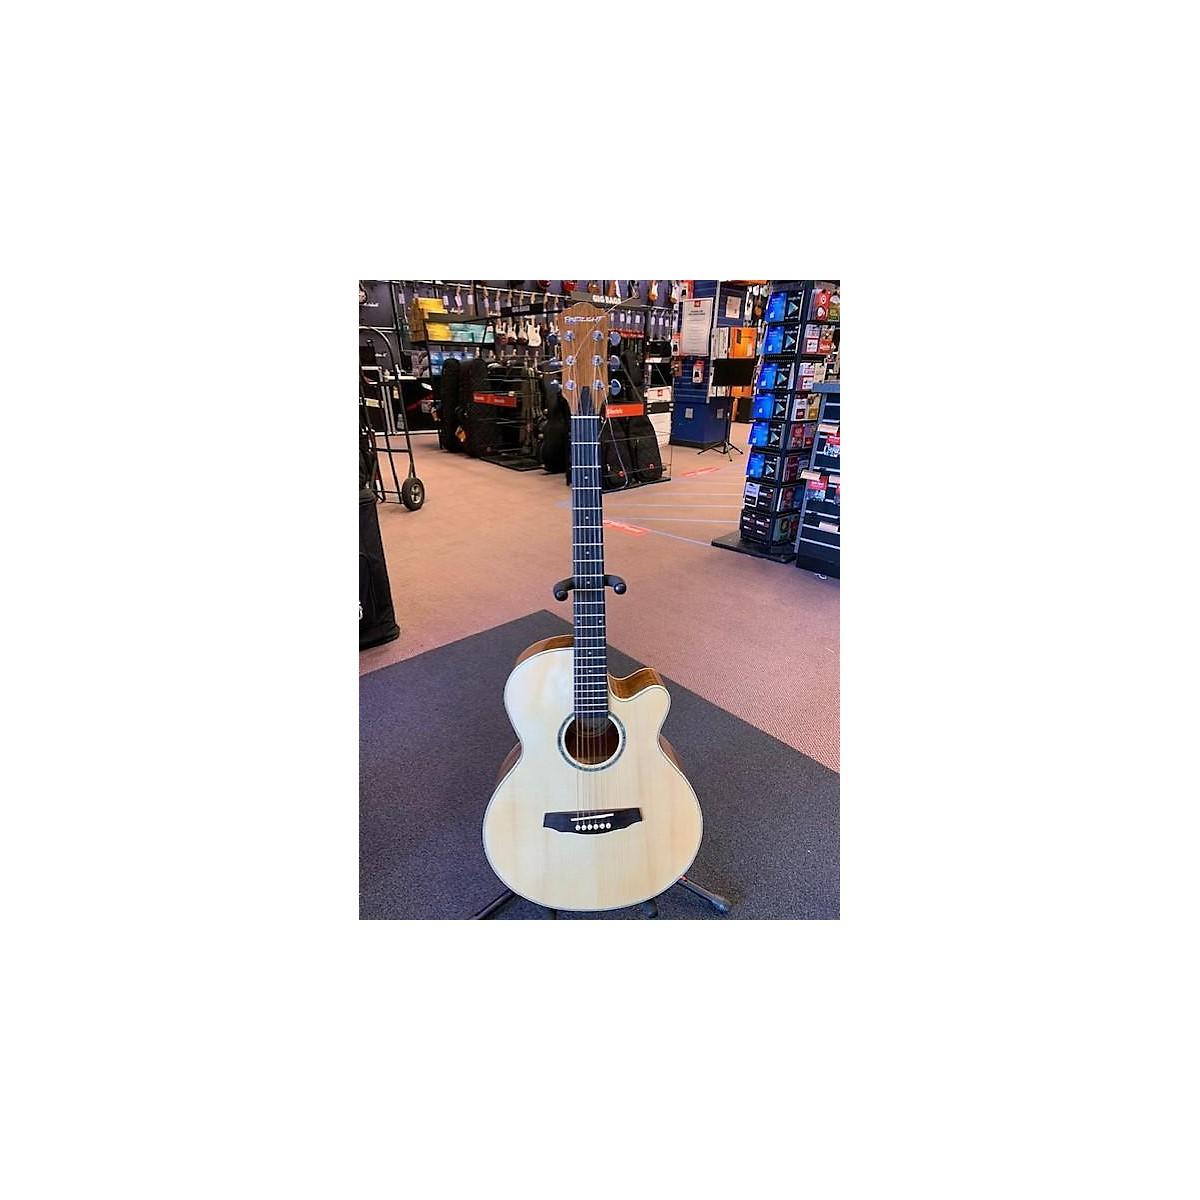 Fretlight FG269 Acoustic Electric Guitar